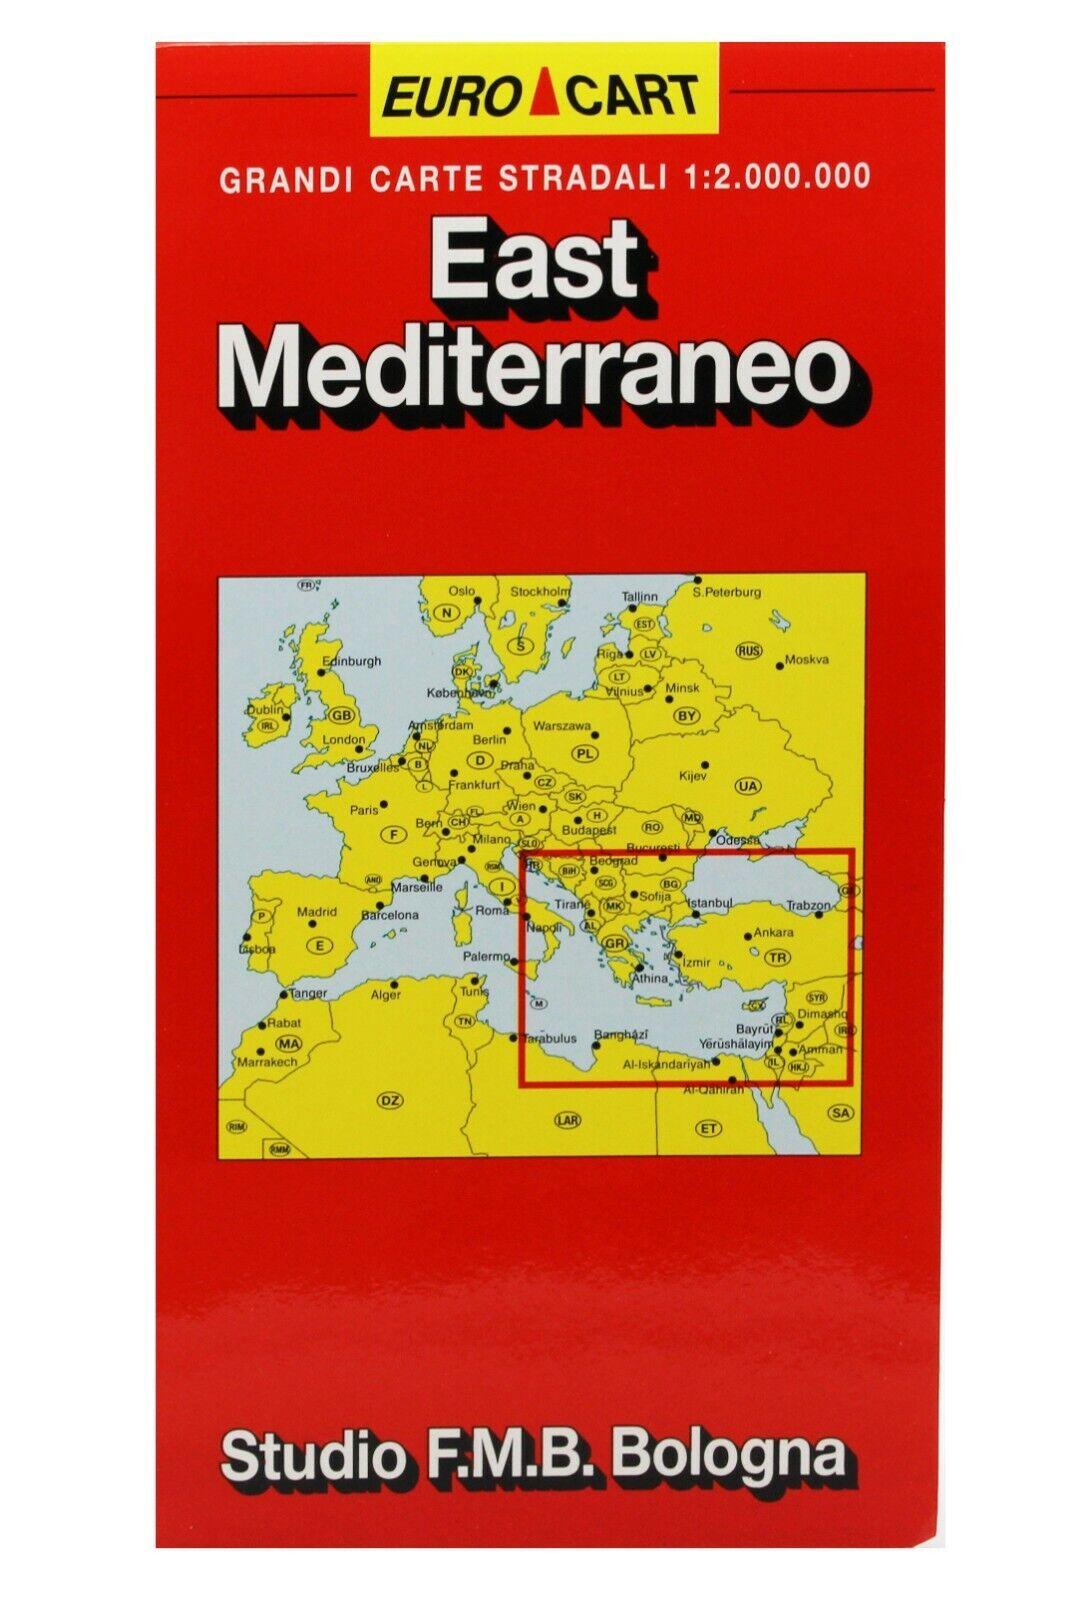 Mediterraneo Cartina.Mediterraneo Est Albania Bosnia Grecia Turchia Cartina Stradale Mappa Ebay